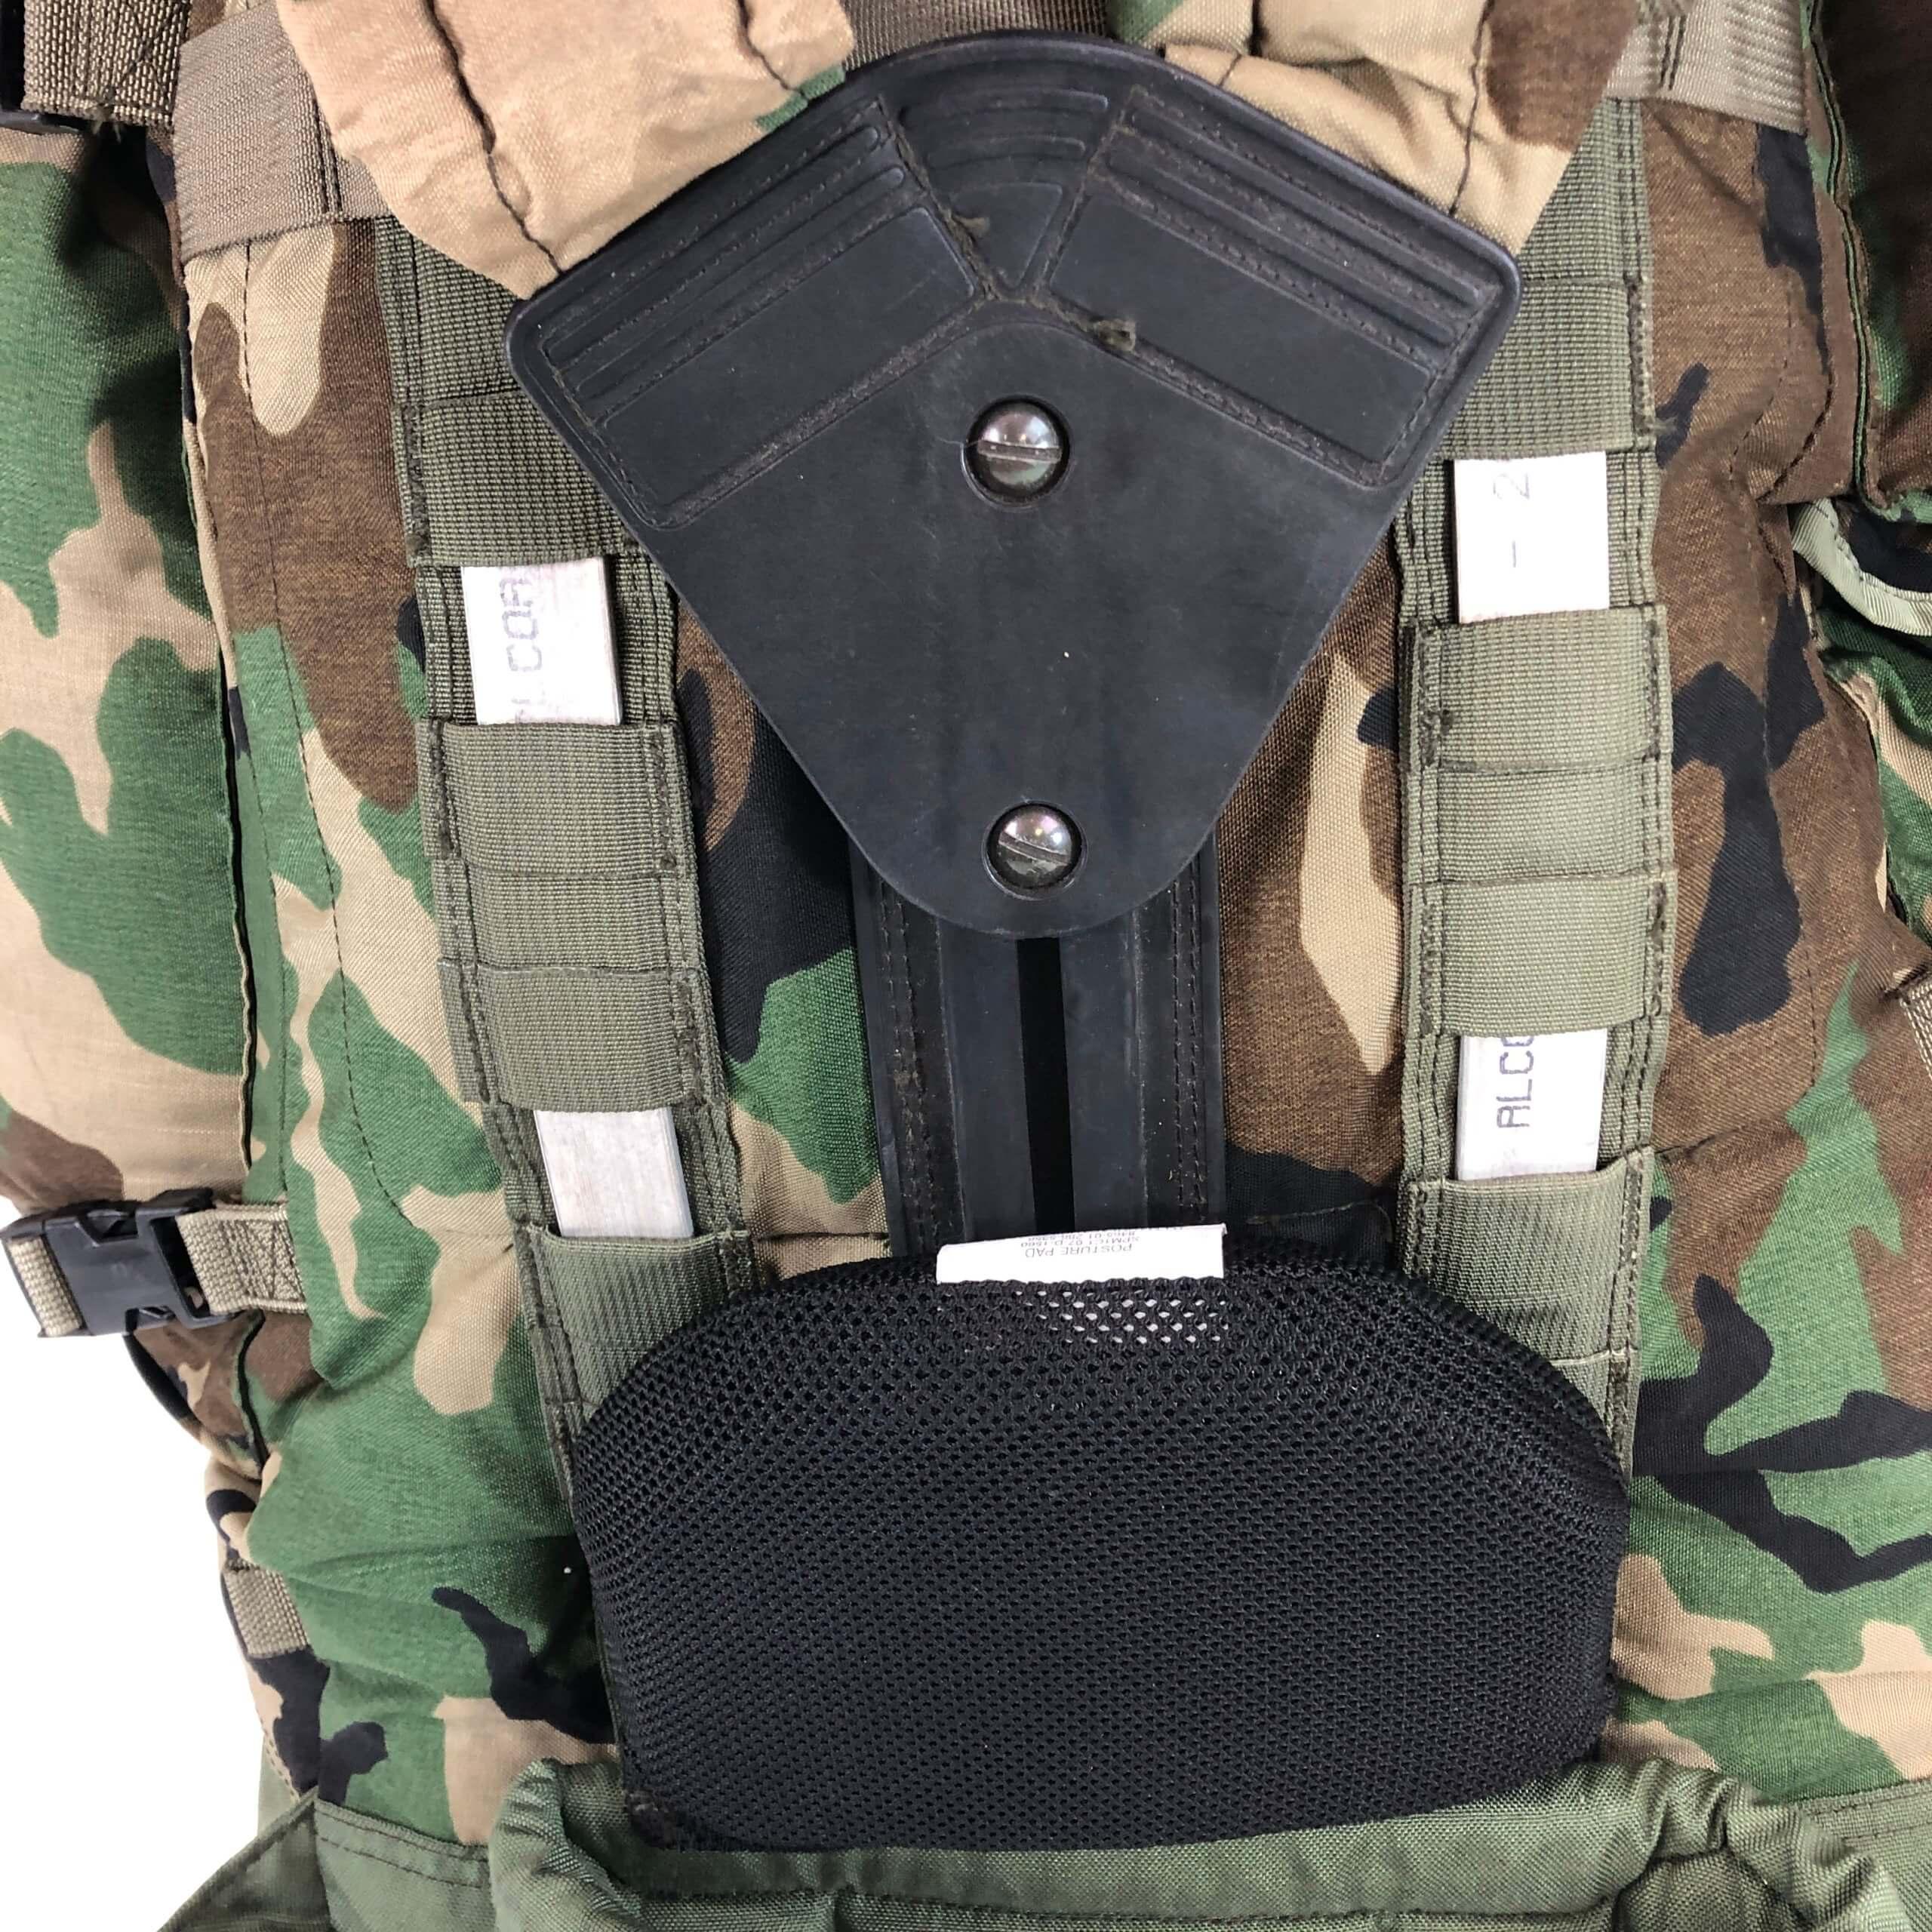 1faafb075b ARMÁDNÍ ORIGINÁL US ARMY Batoh US Ranger CFP-90 Molle woodland 90L  Varianta  bez